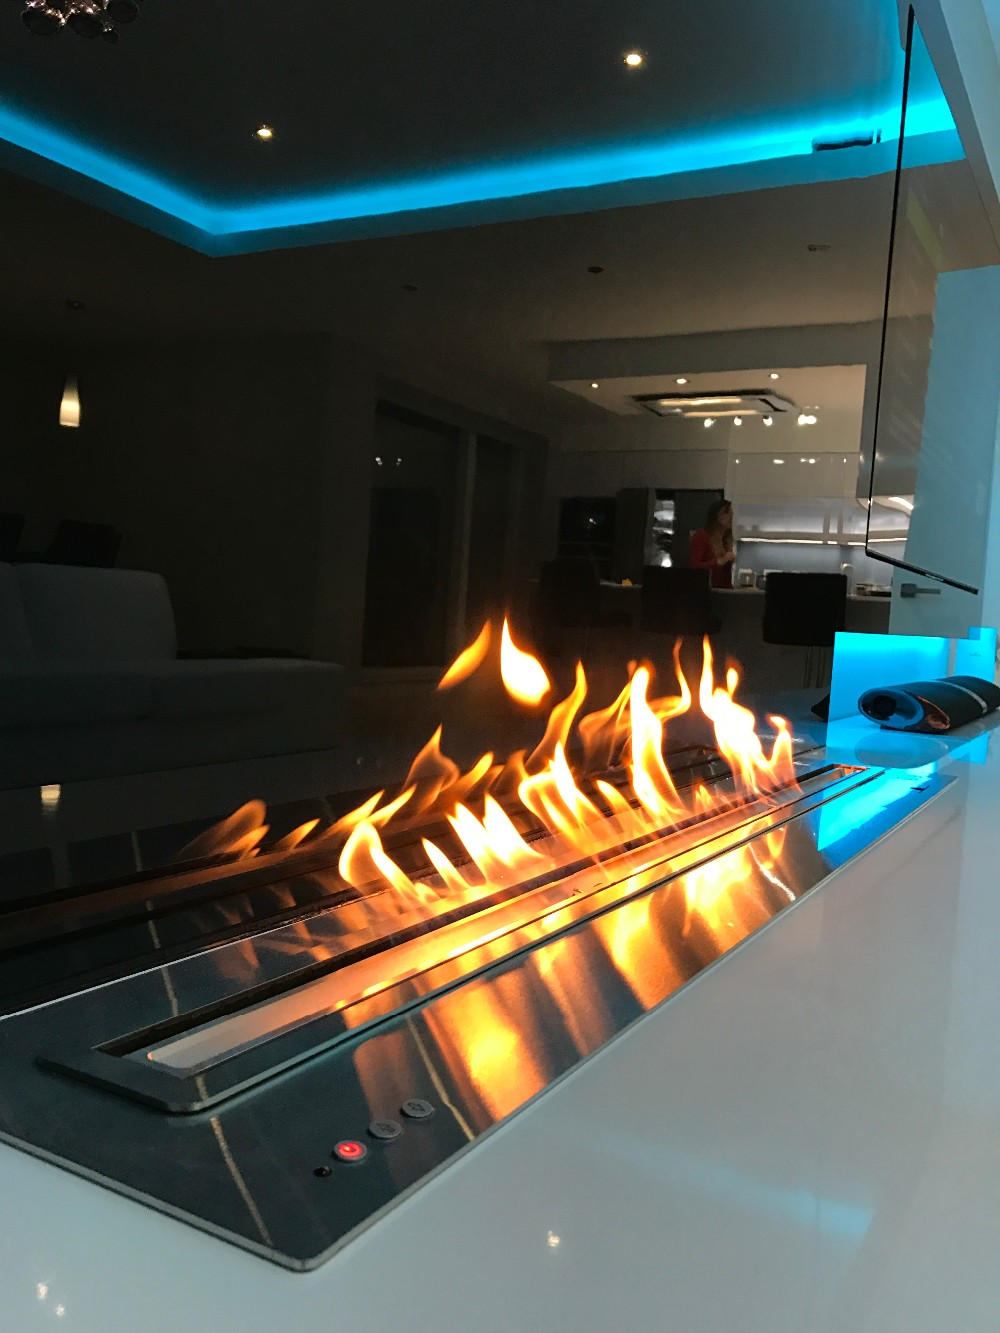 On Sale 60'' Ethanol Bioethanol Fireplace With Wifi Contact Chimenea Interior